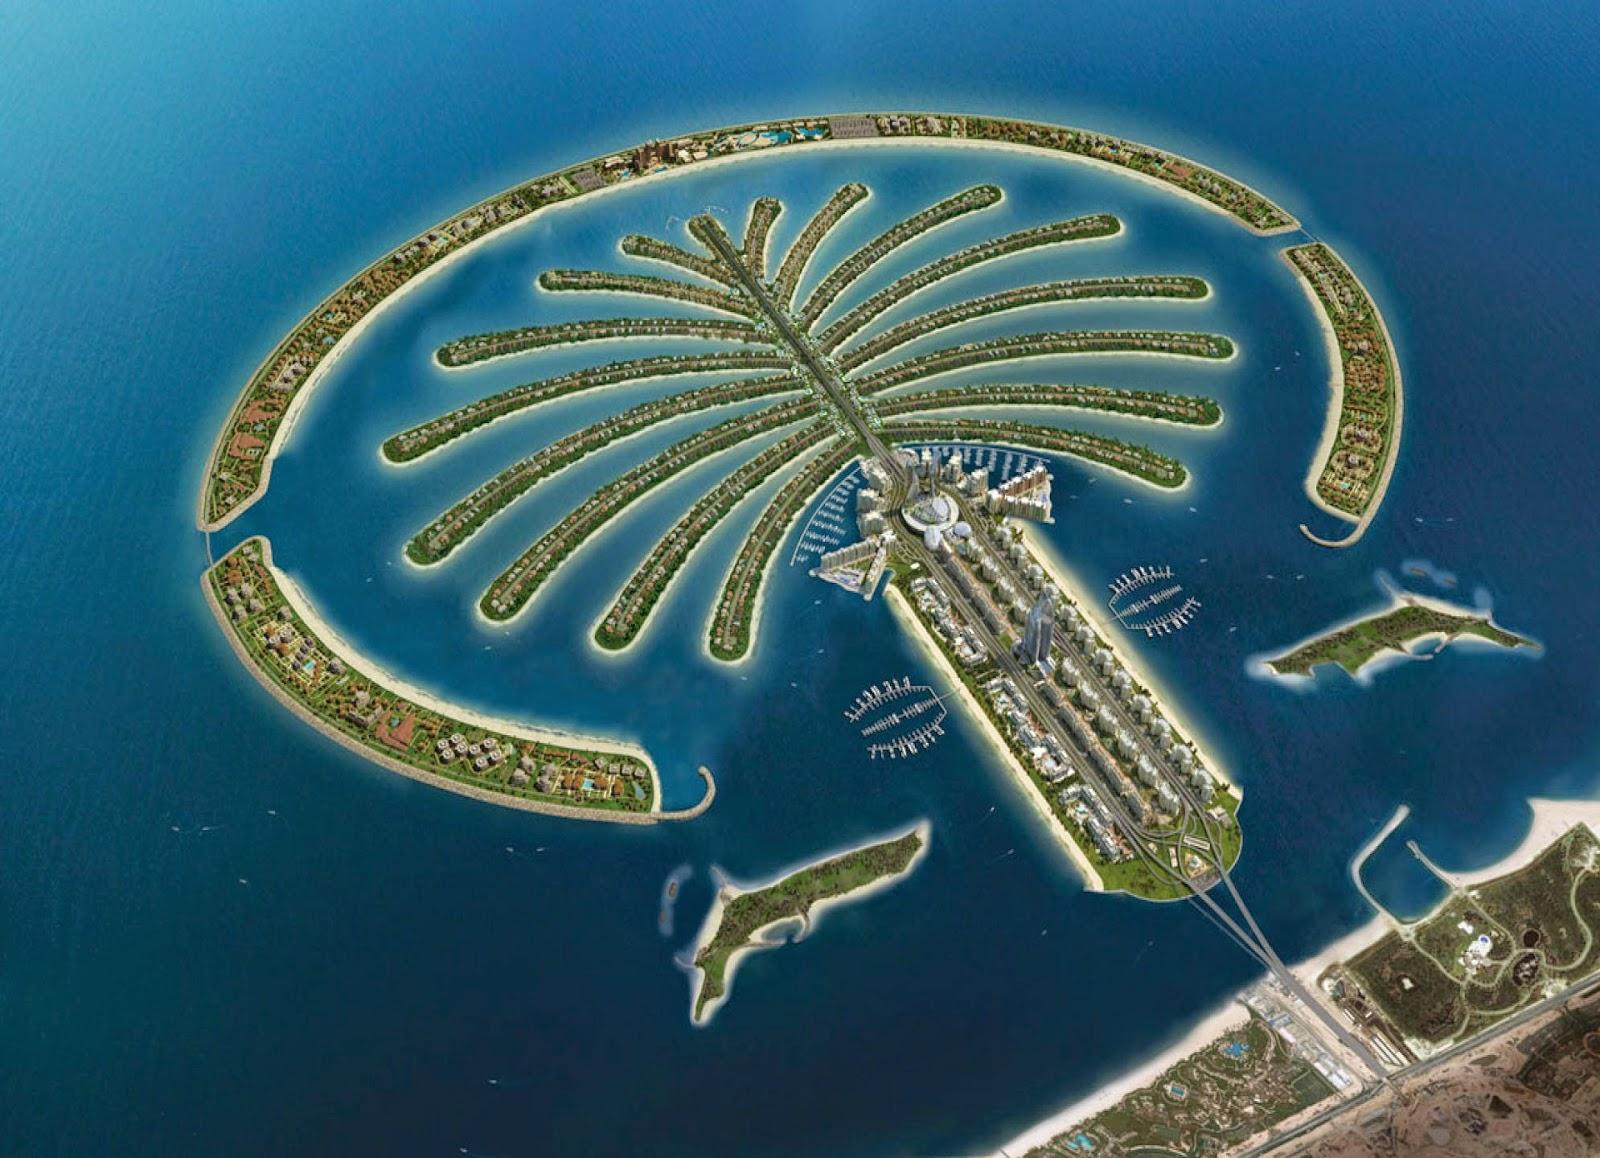 Attractive Destinations in Dubai - Palm Jumeriah